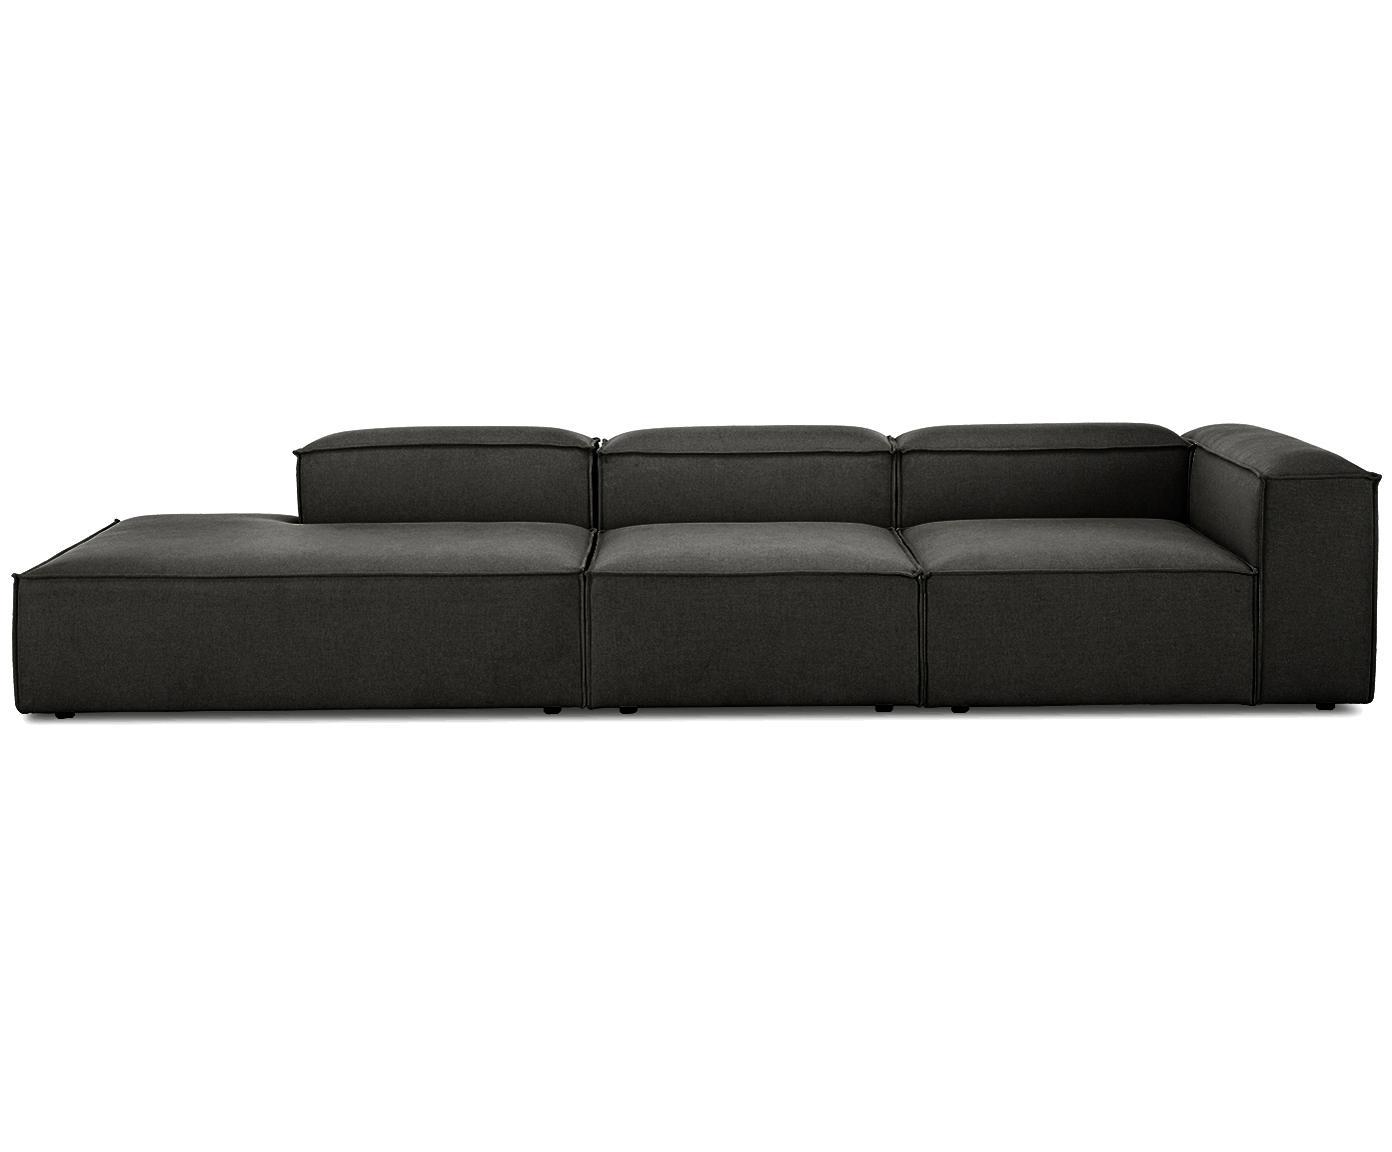 Modulaire XL chaise longue Lennon, Bekleding: polyester, Frame: massief grenenhout, multi, Poten: kunststof, Antraciet, B 357 x D 119 cm